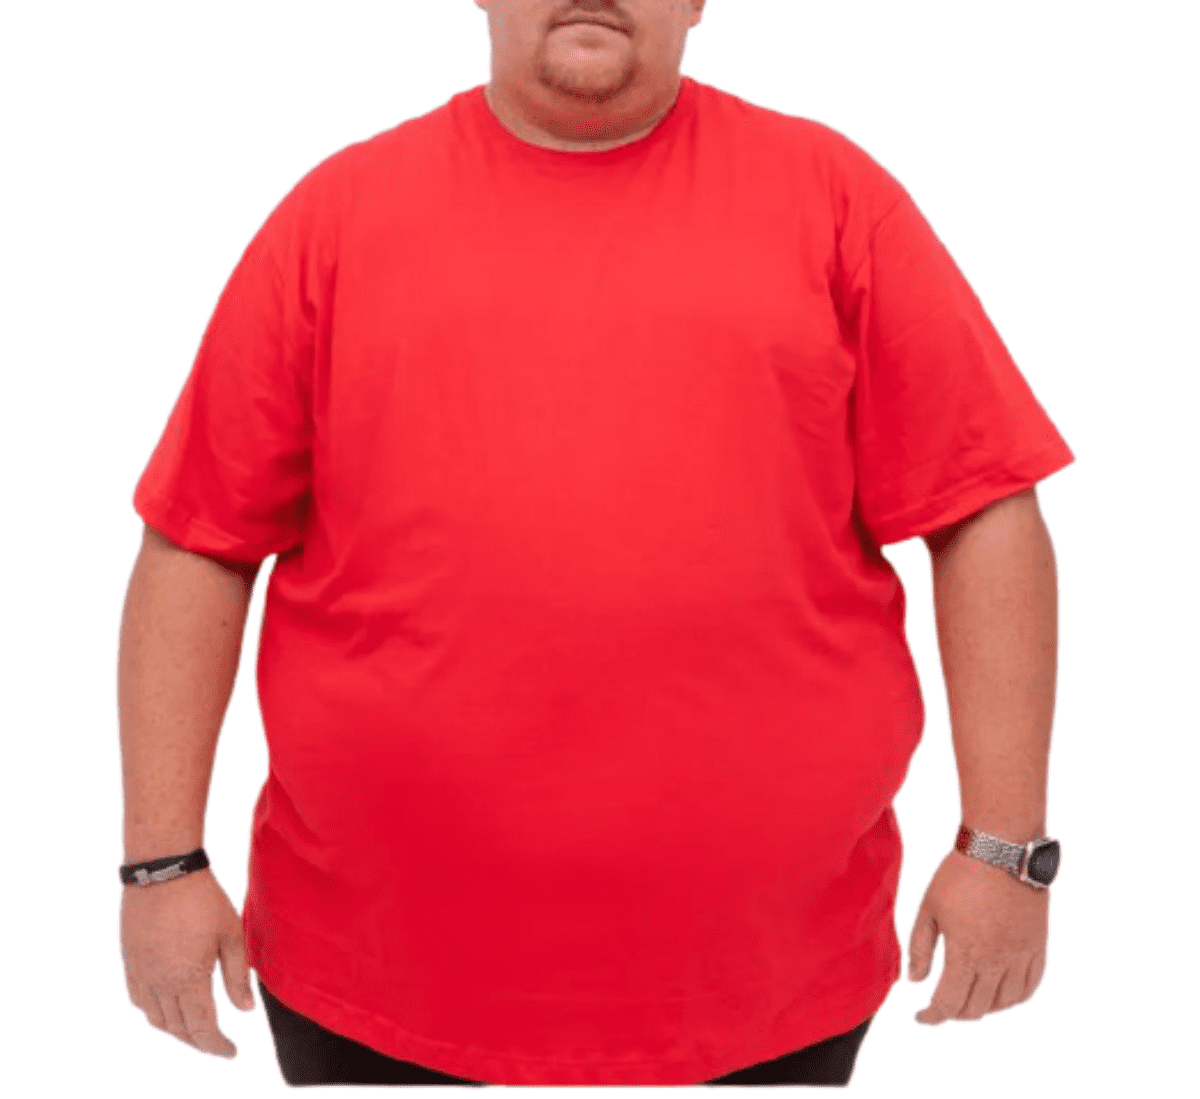 Camiseta extra grande G4 G5 G6 manga curta gola careca